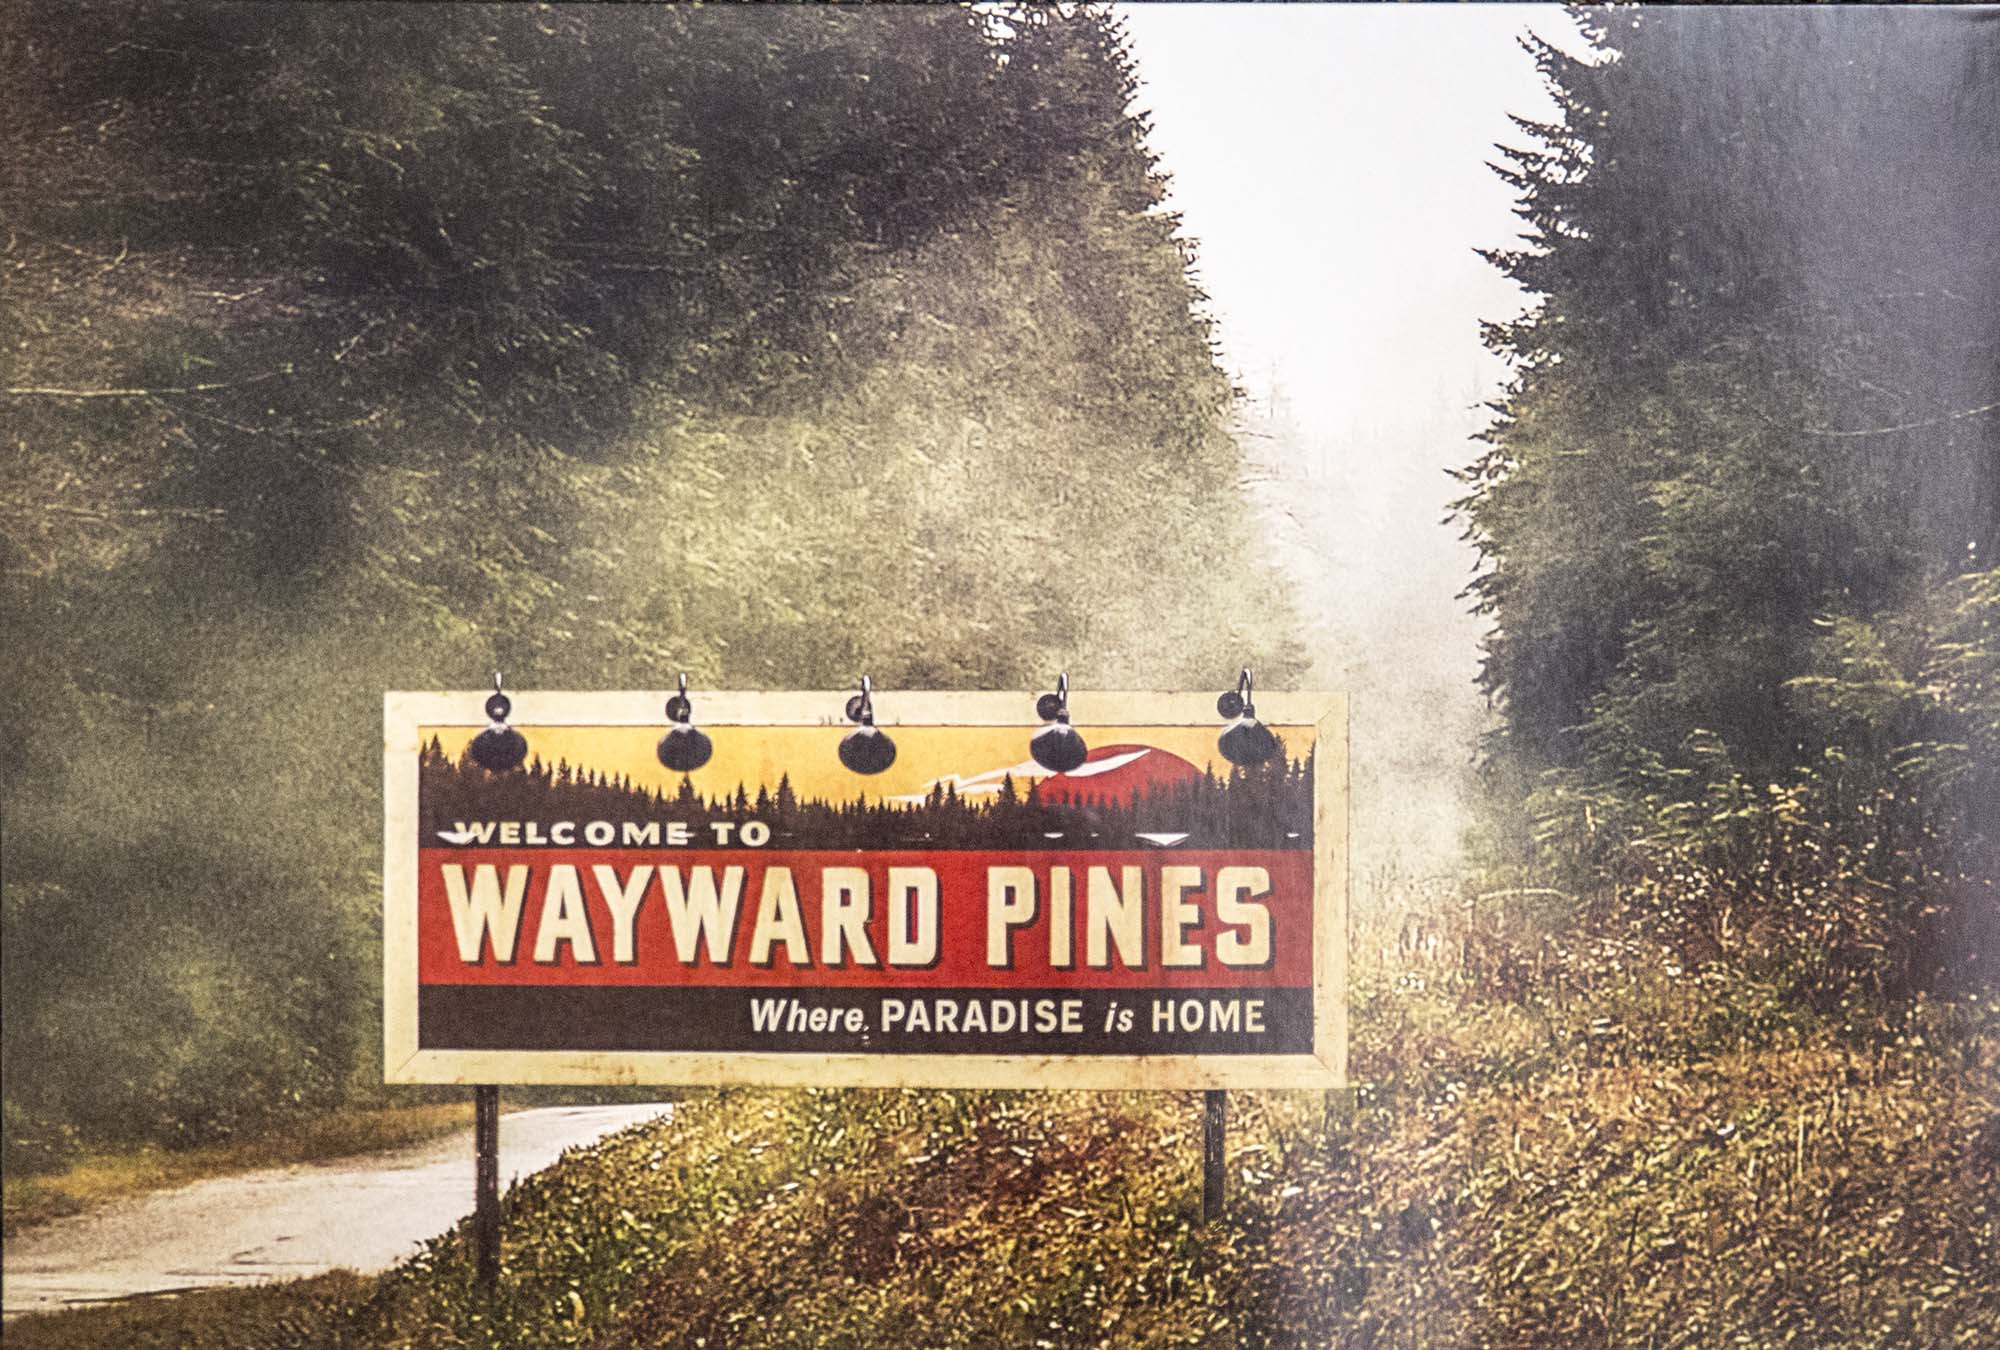 Bienvenue à Wayward Pines